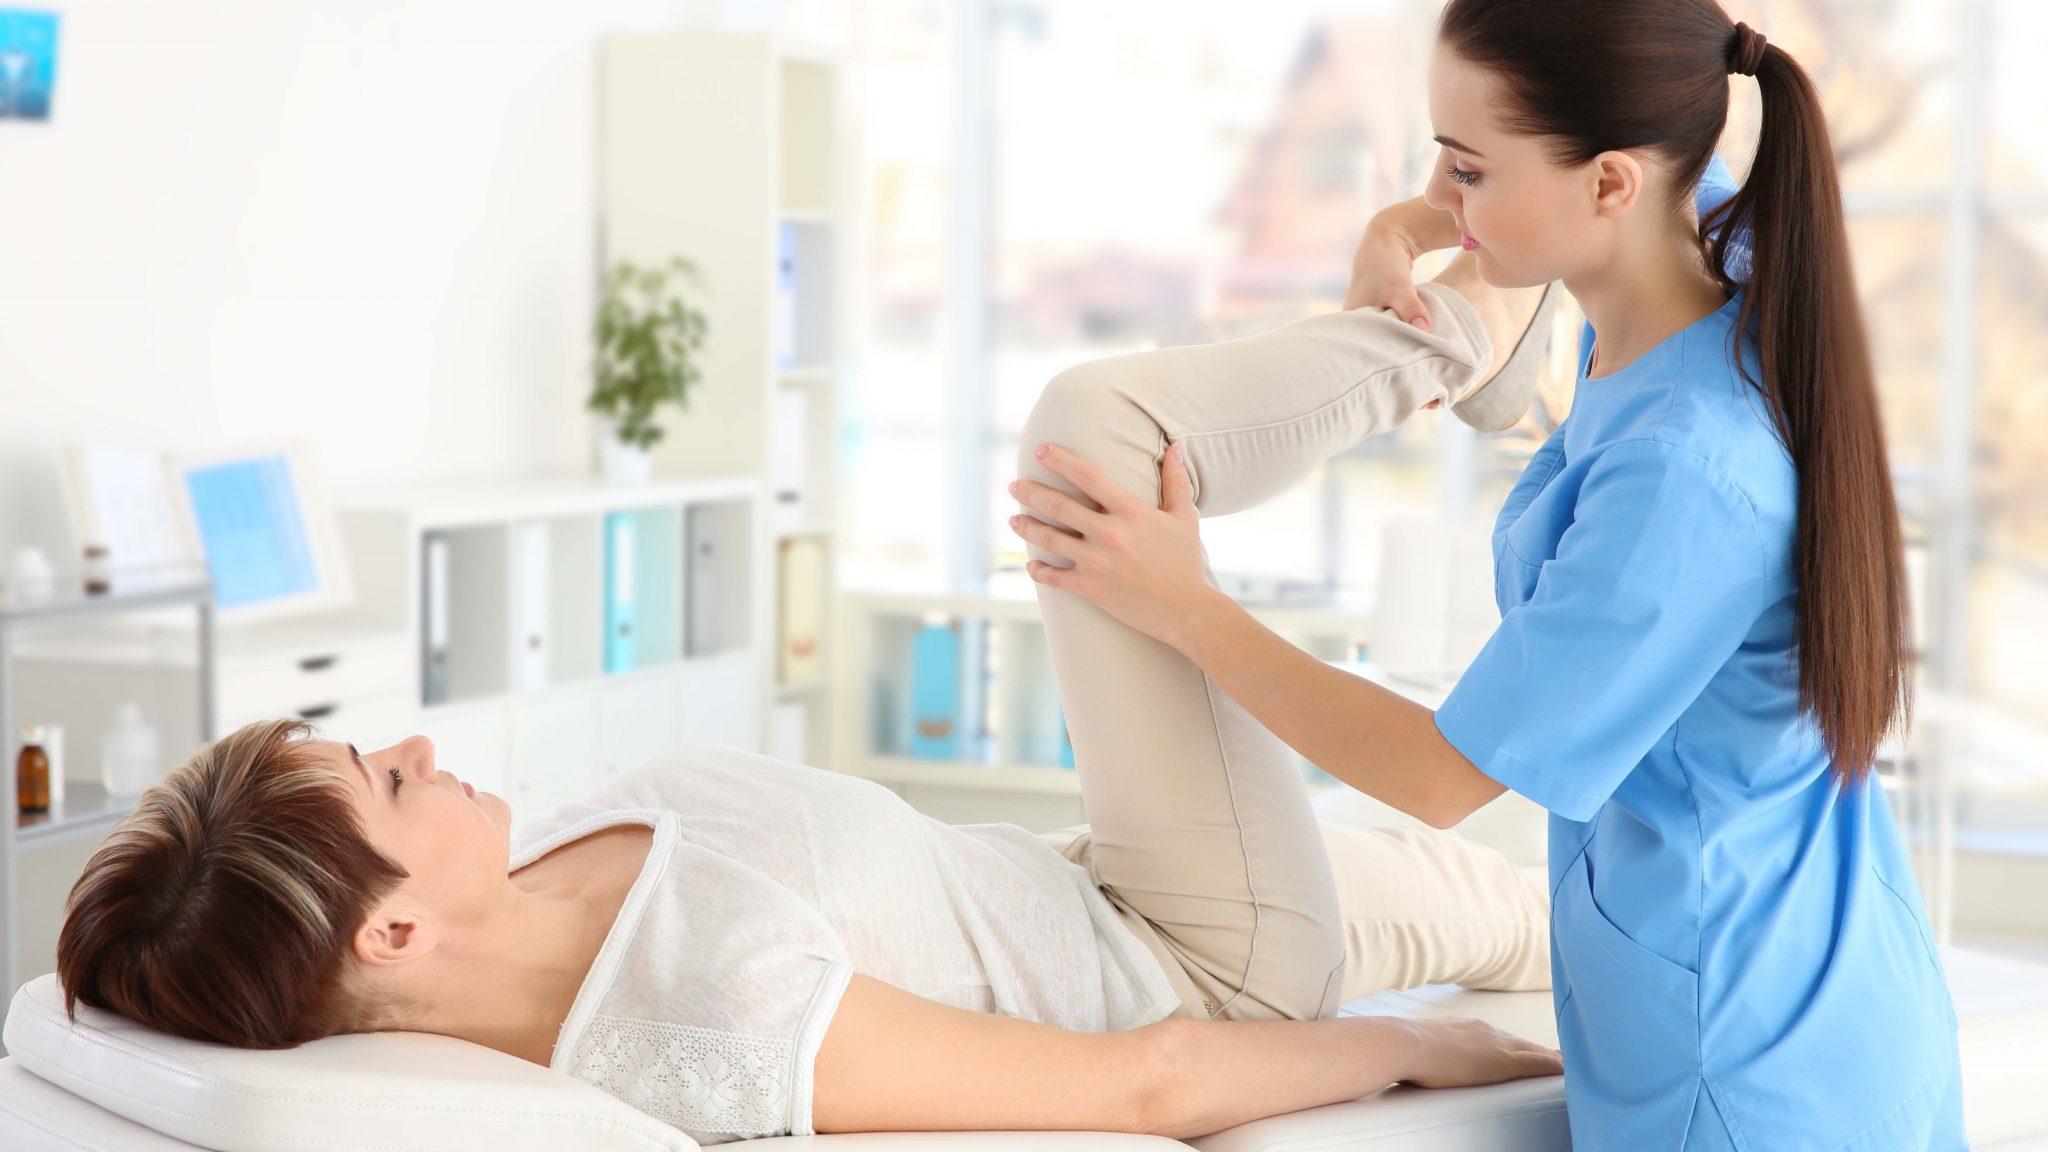 Curso de Auxiliar de Fisioterapia e Massagem